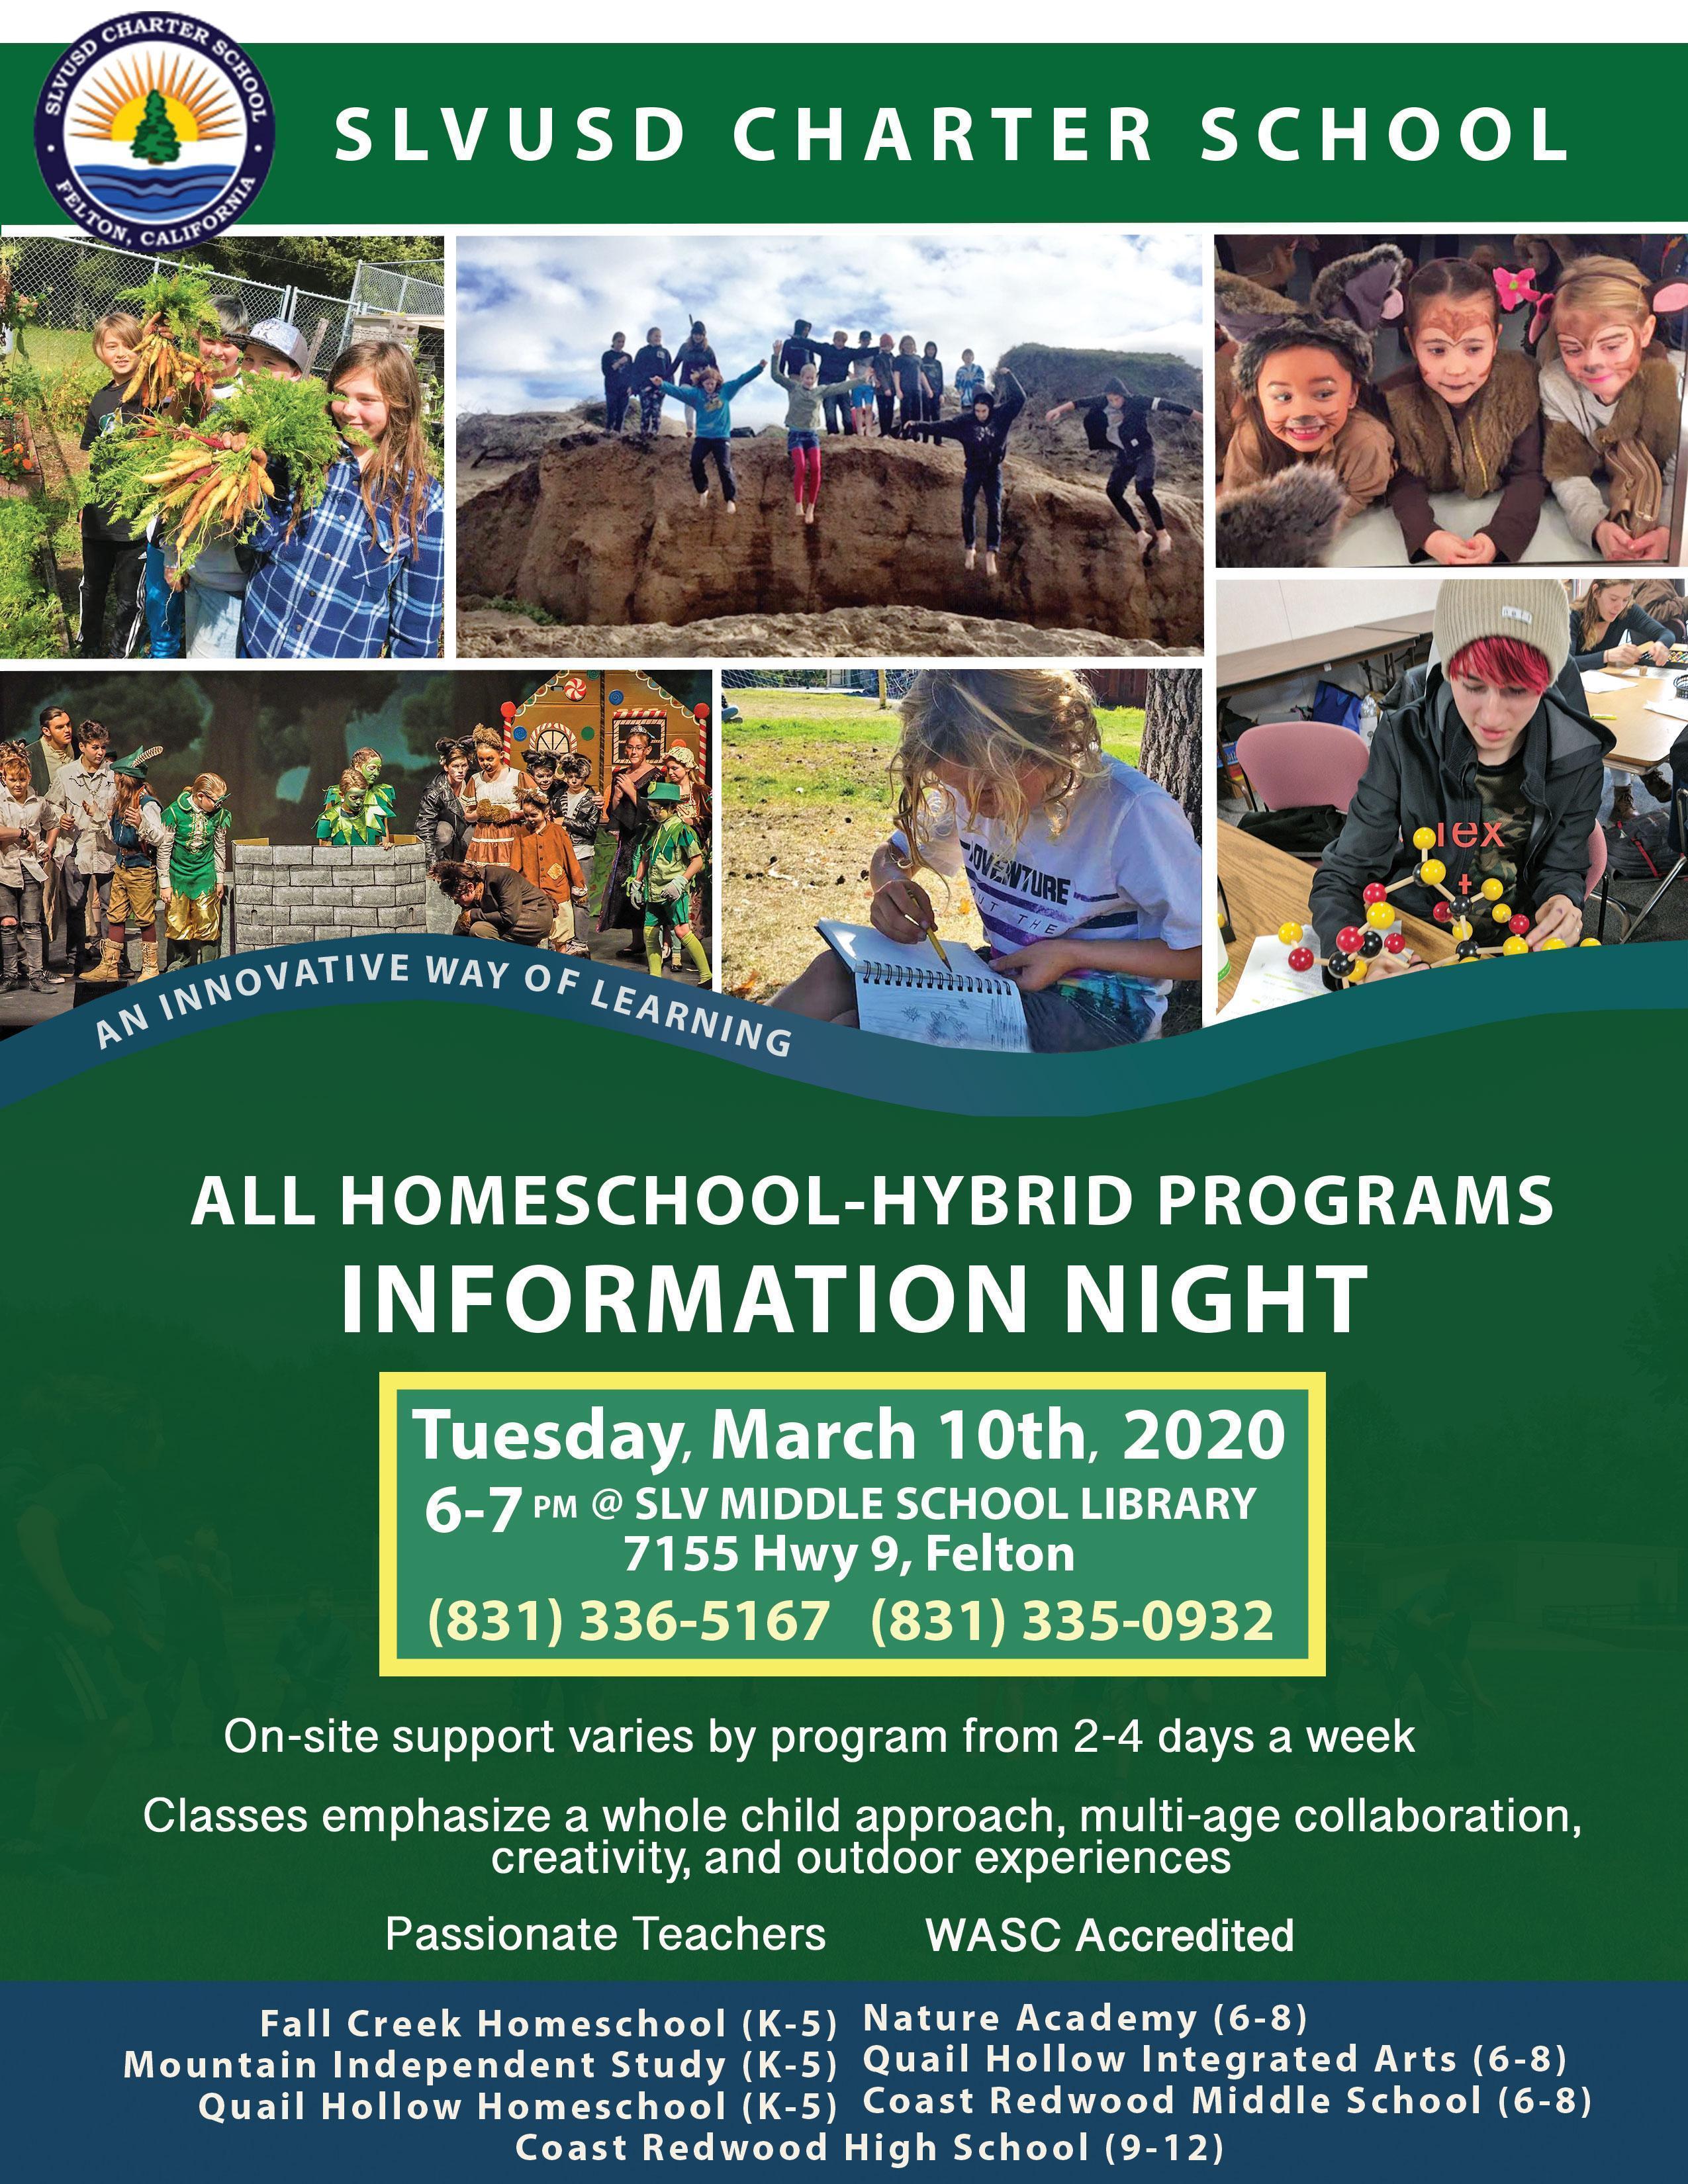 Homeschool Information Night